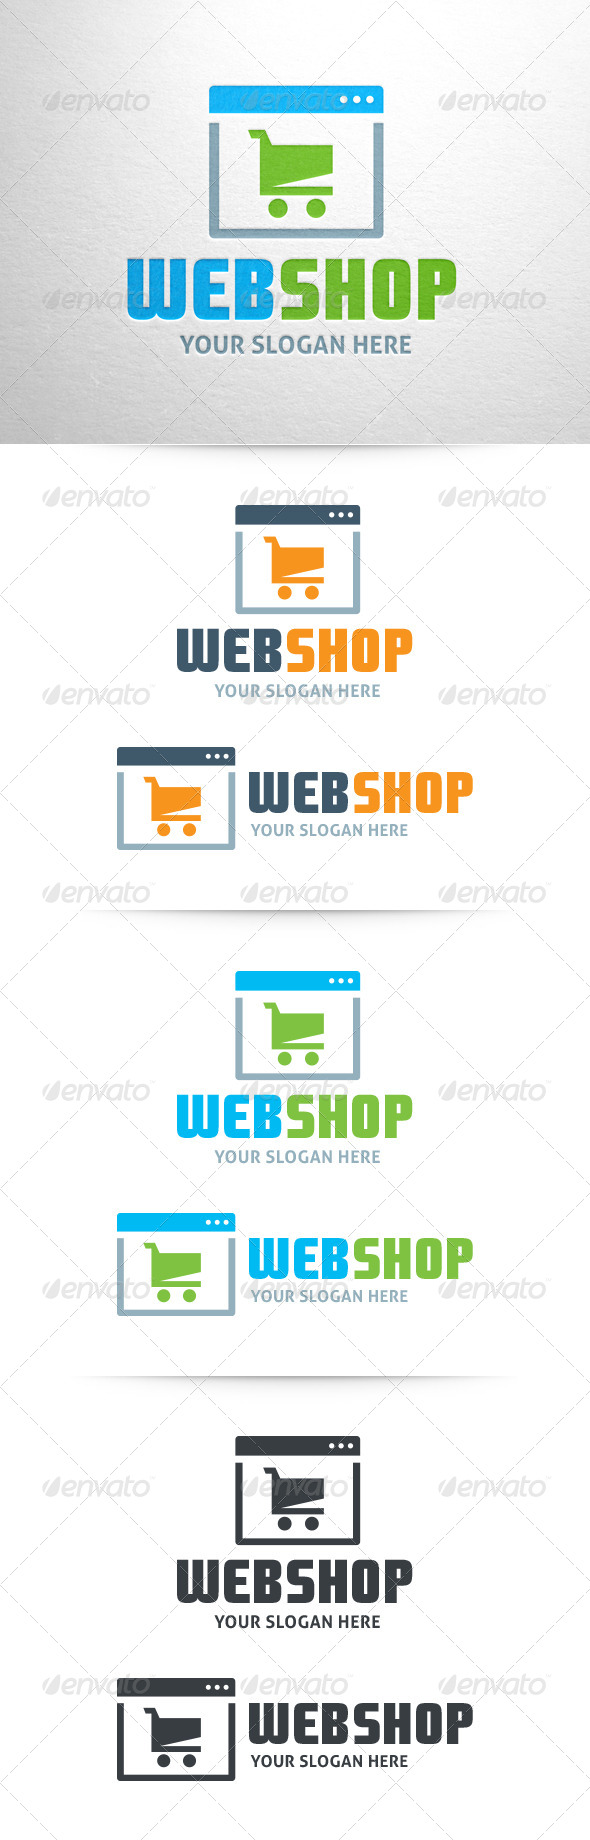 Webshop Logo Template